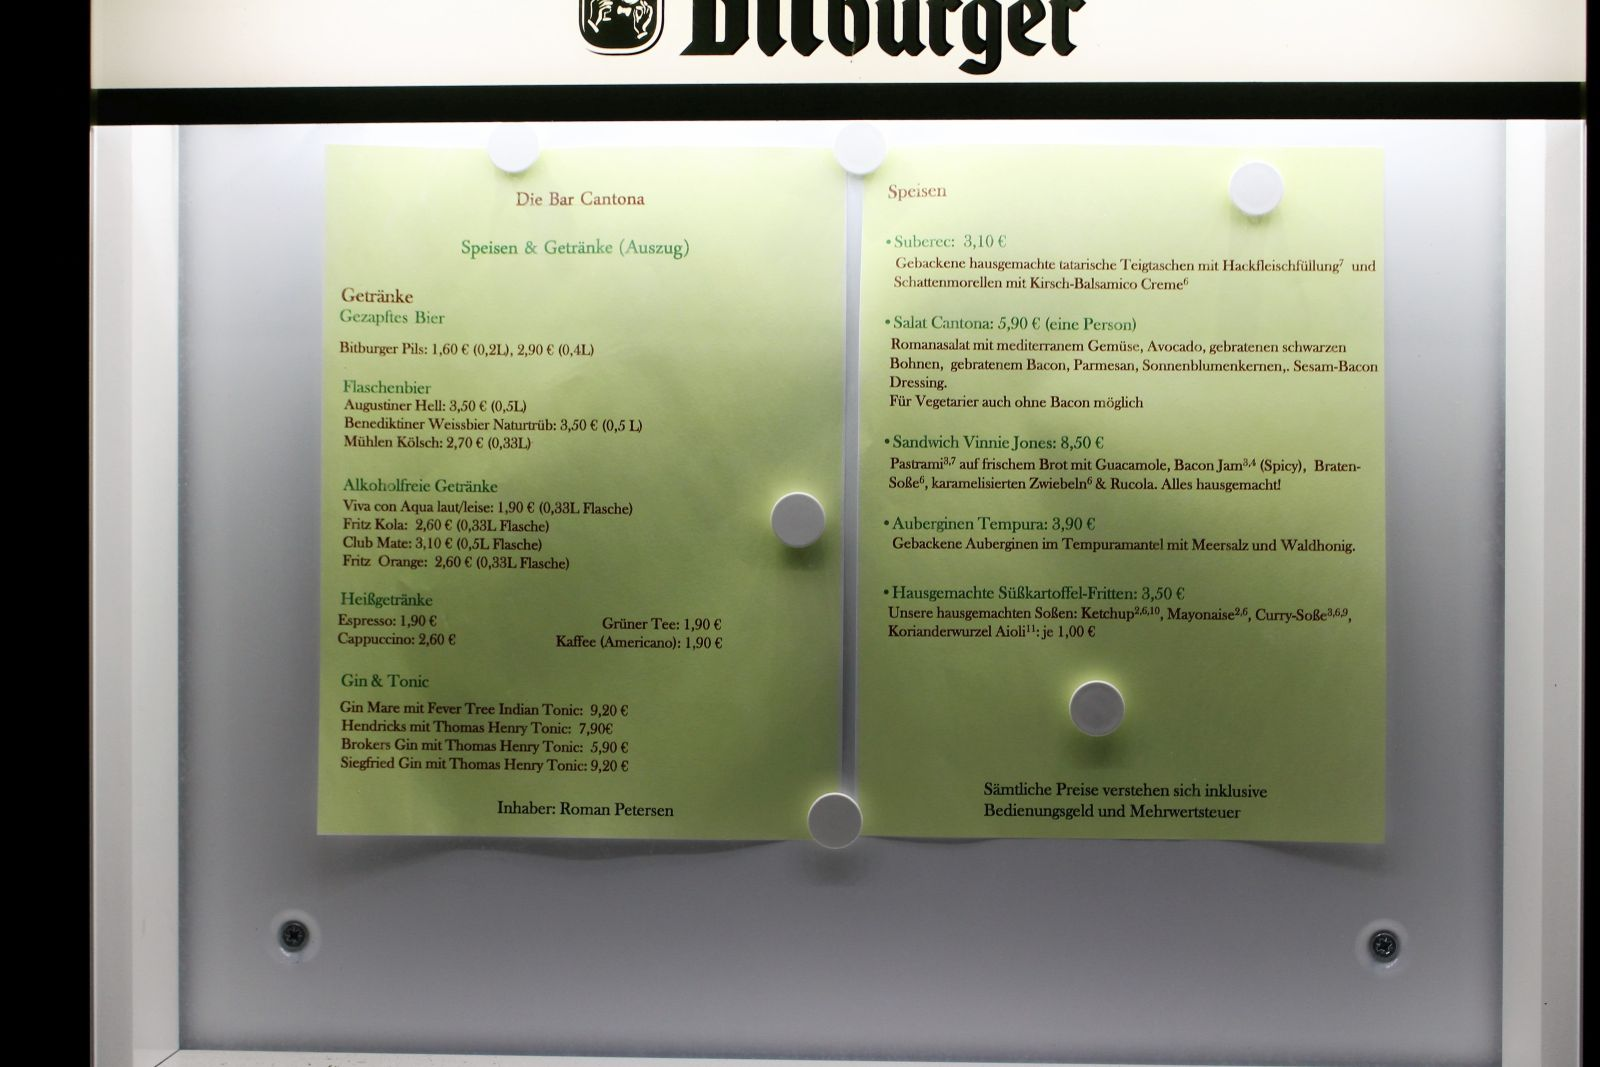 frankenberger-diebarcantona-005